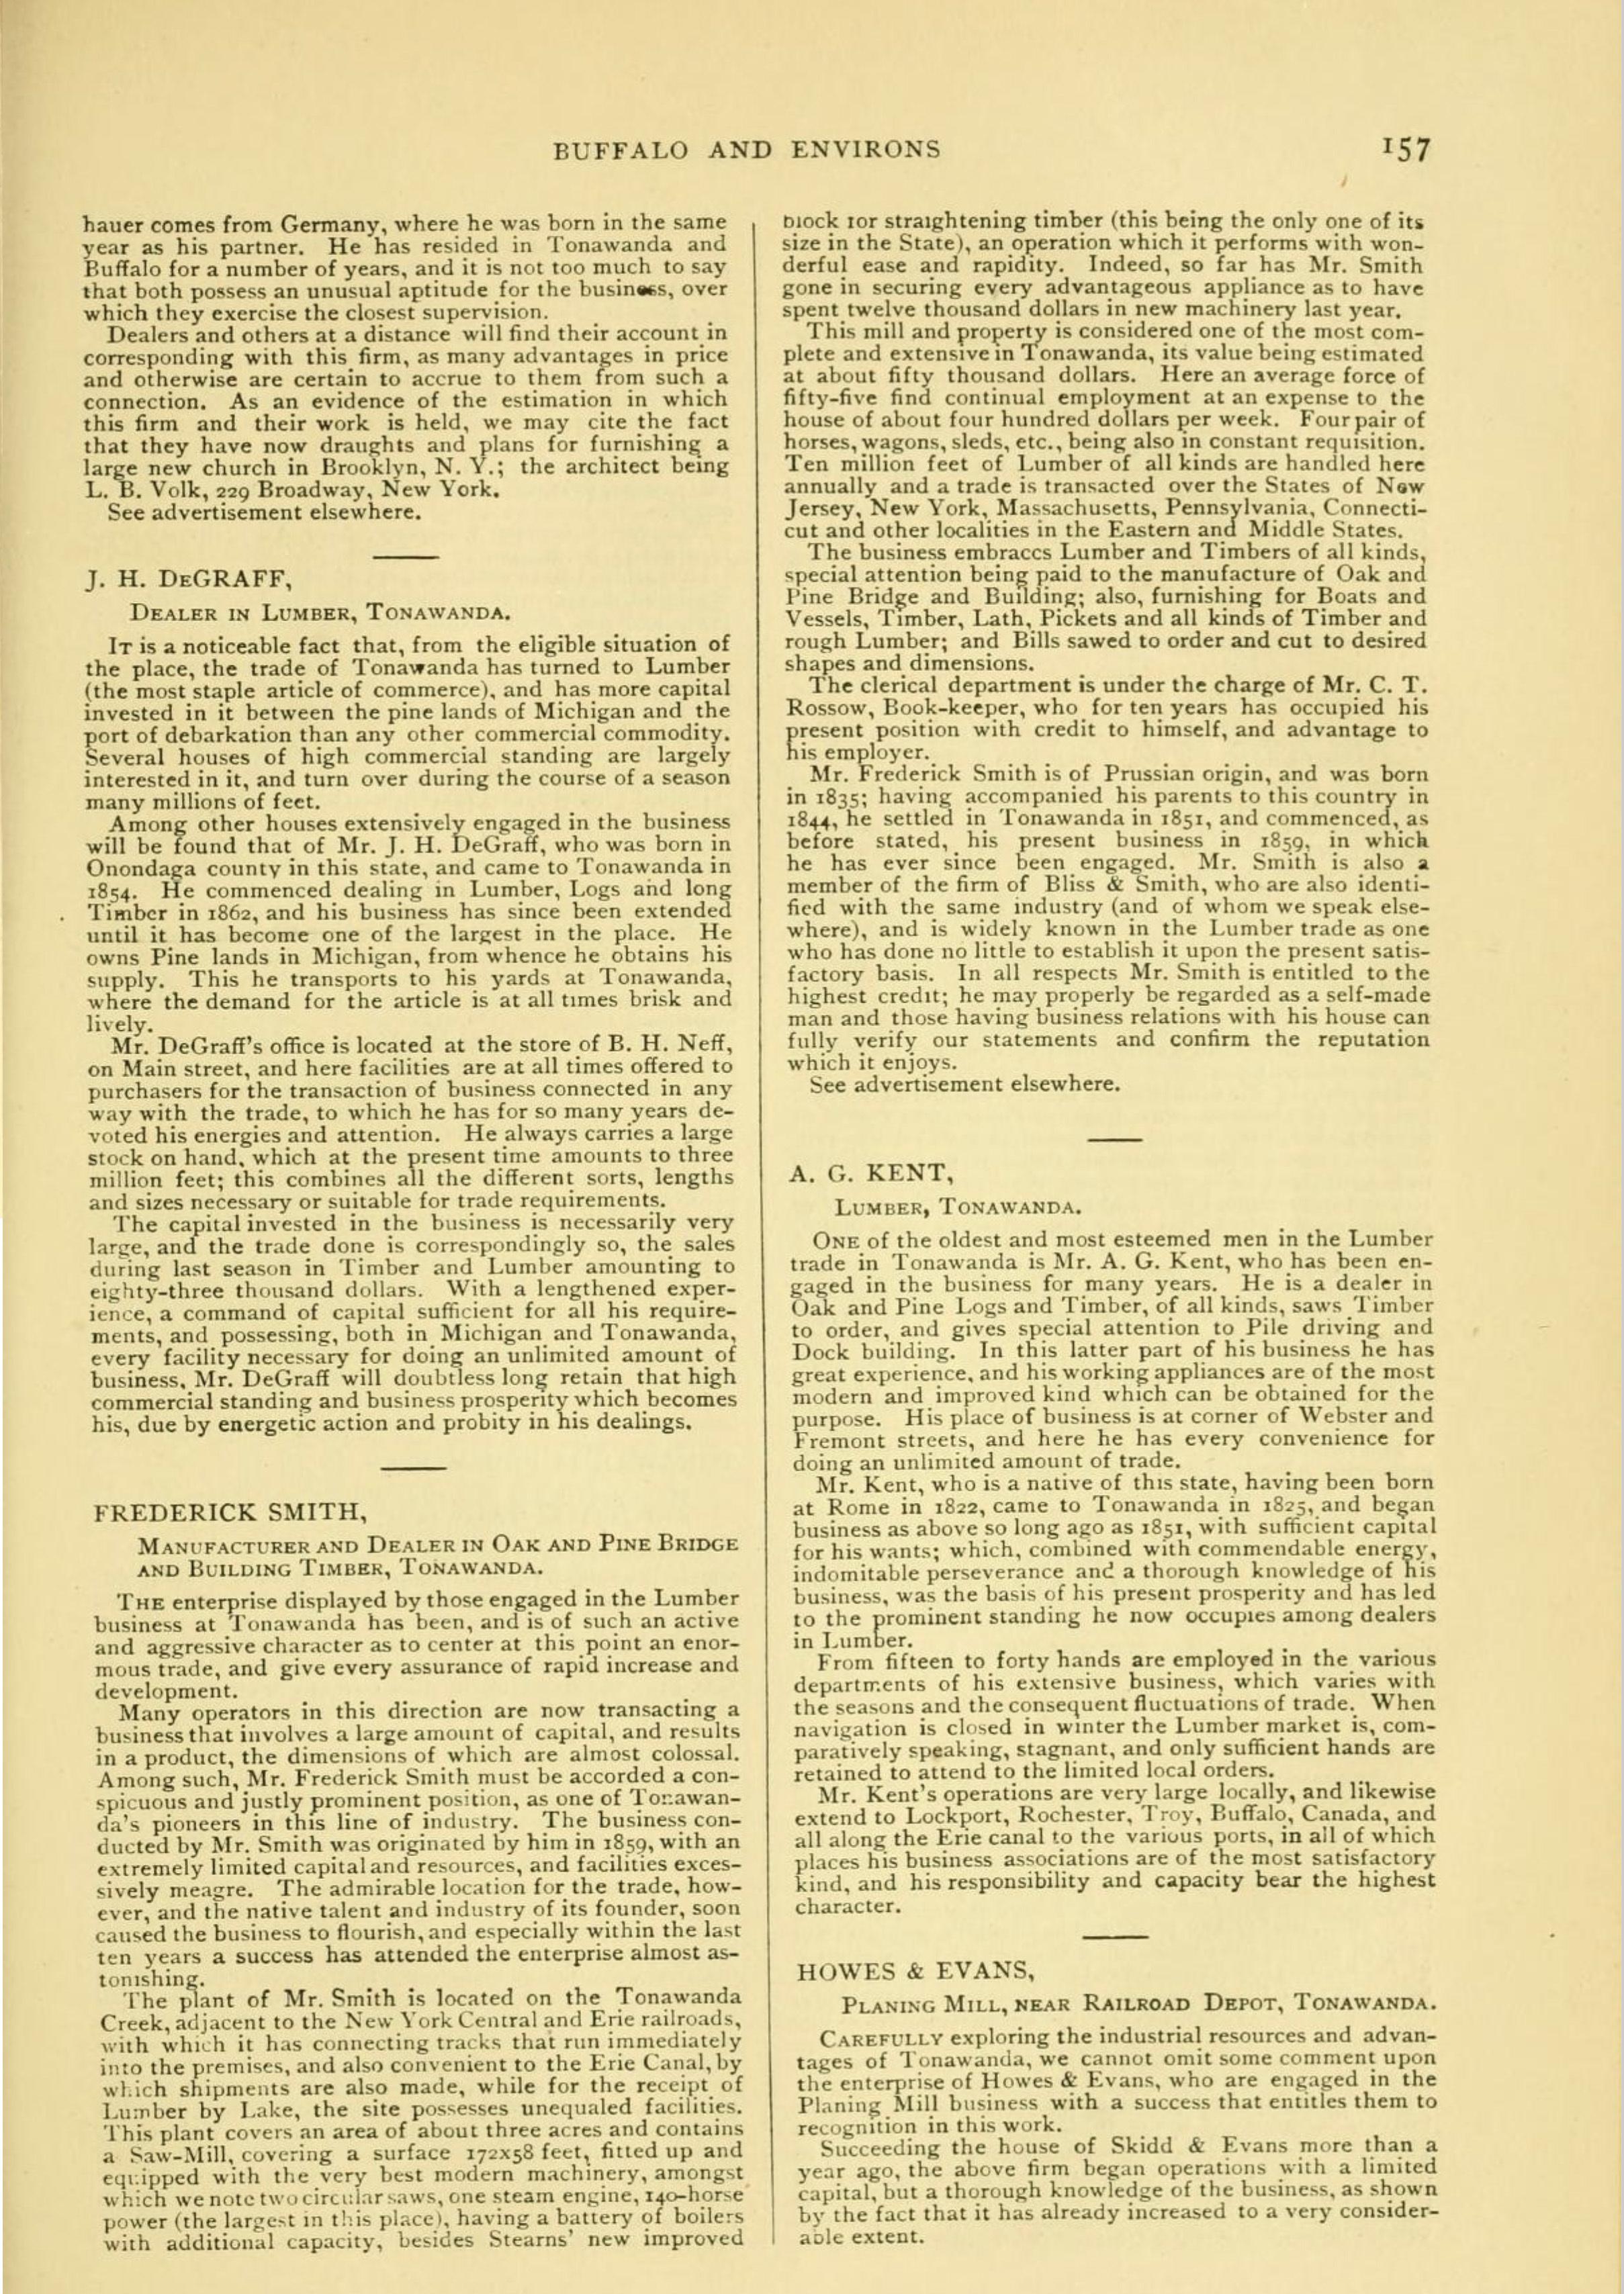 Tonawanda, book excerpt (Commerce, 1880) p157.jpg